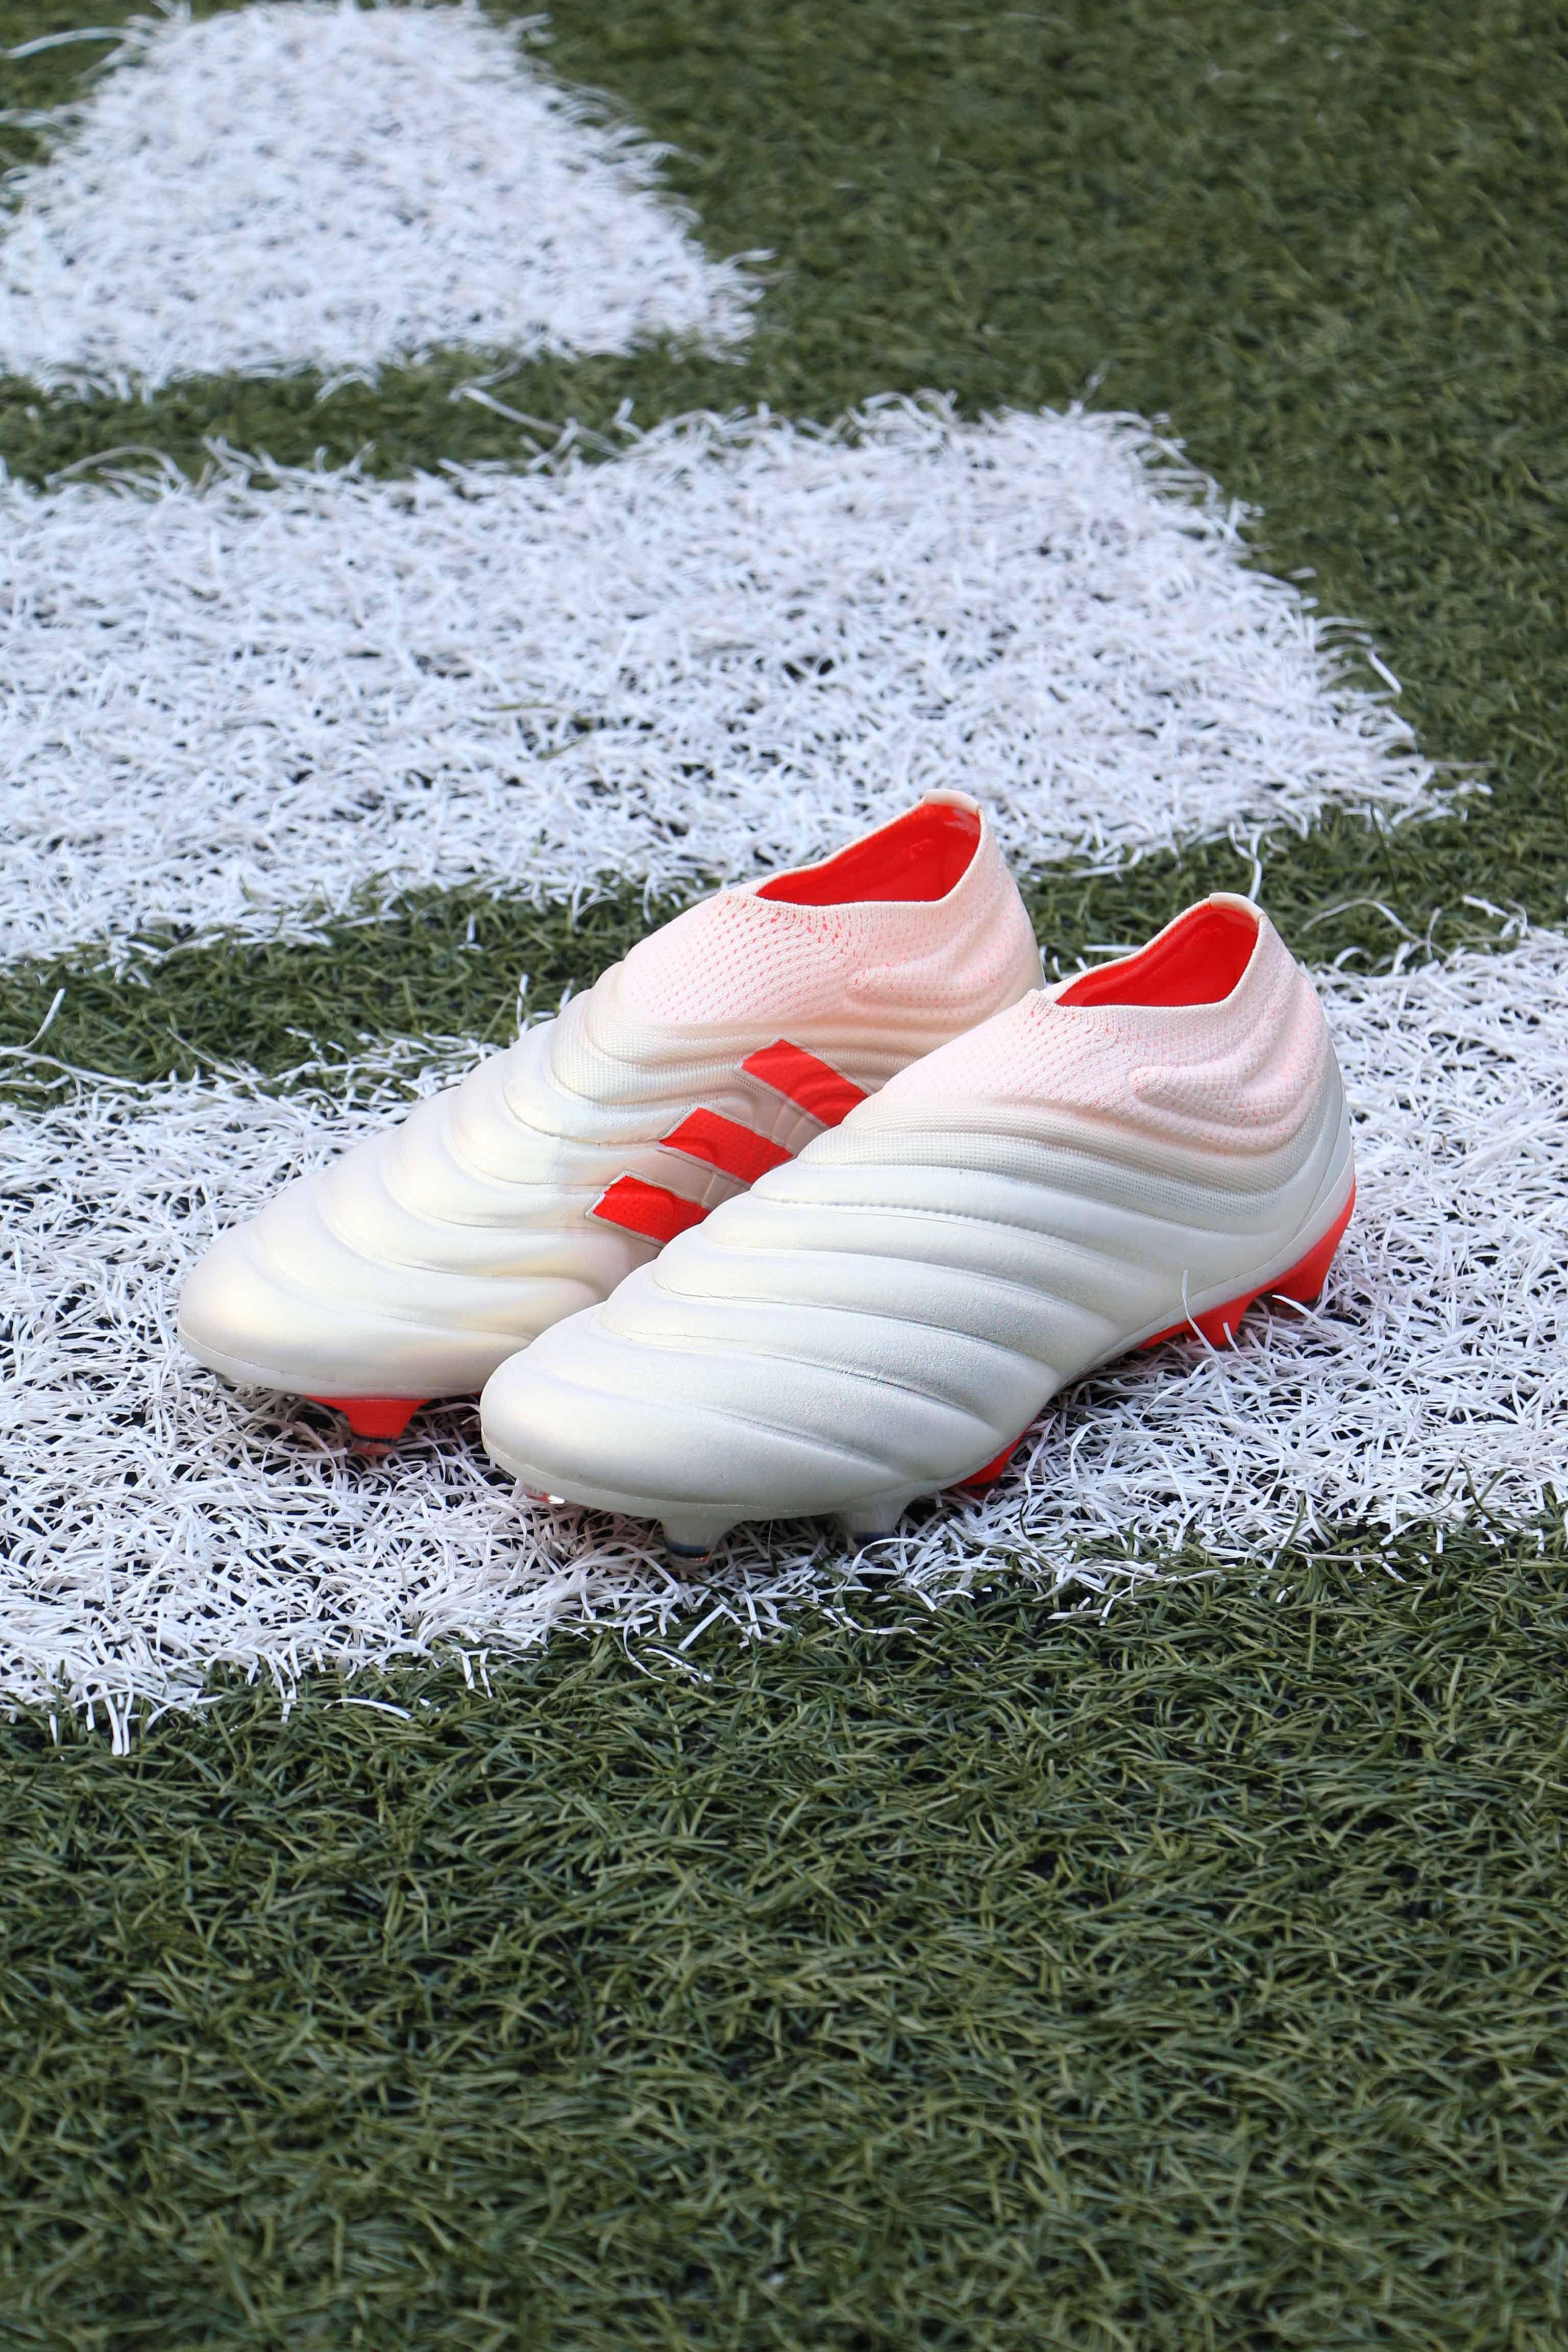 Botas con tacos adidas Copa 19 Initiator Pack